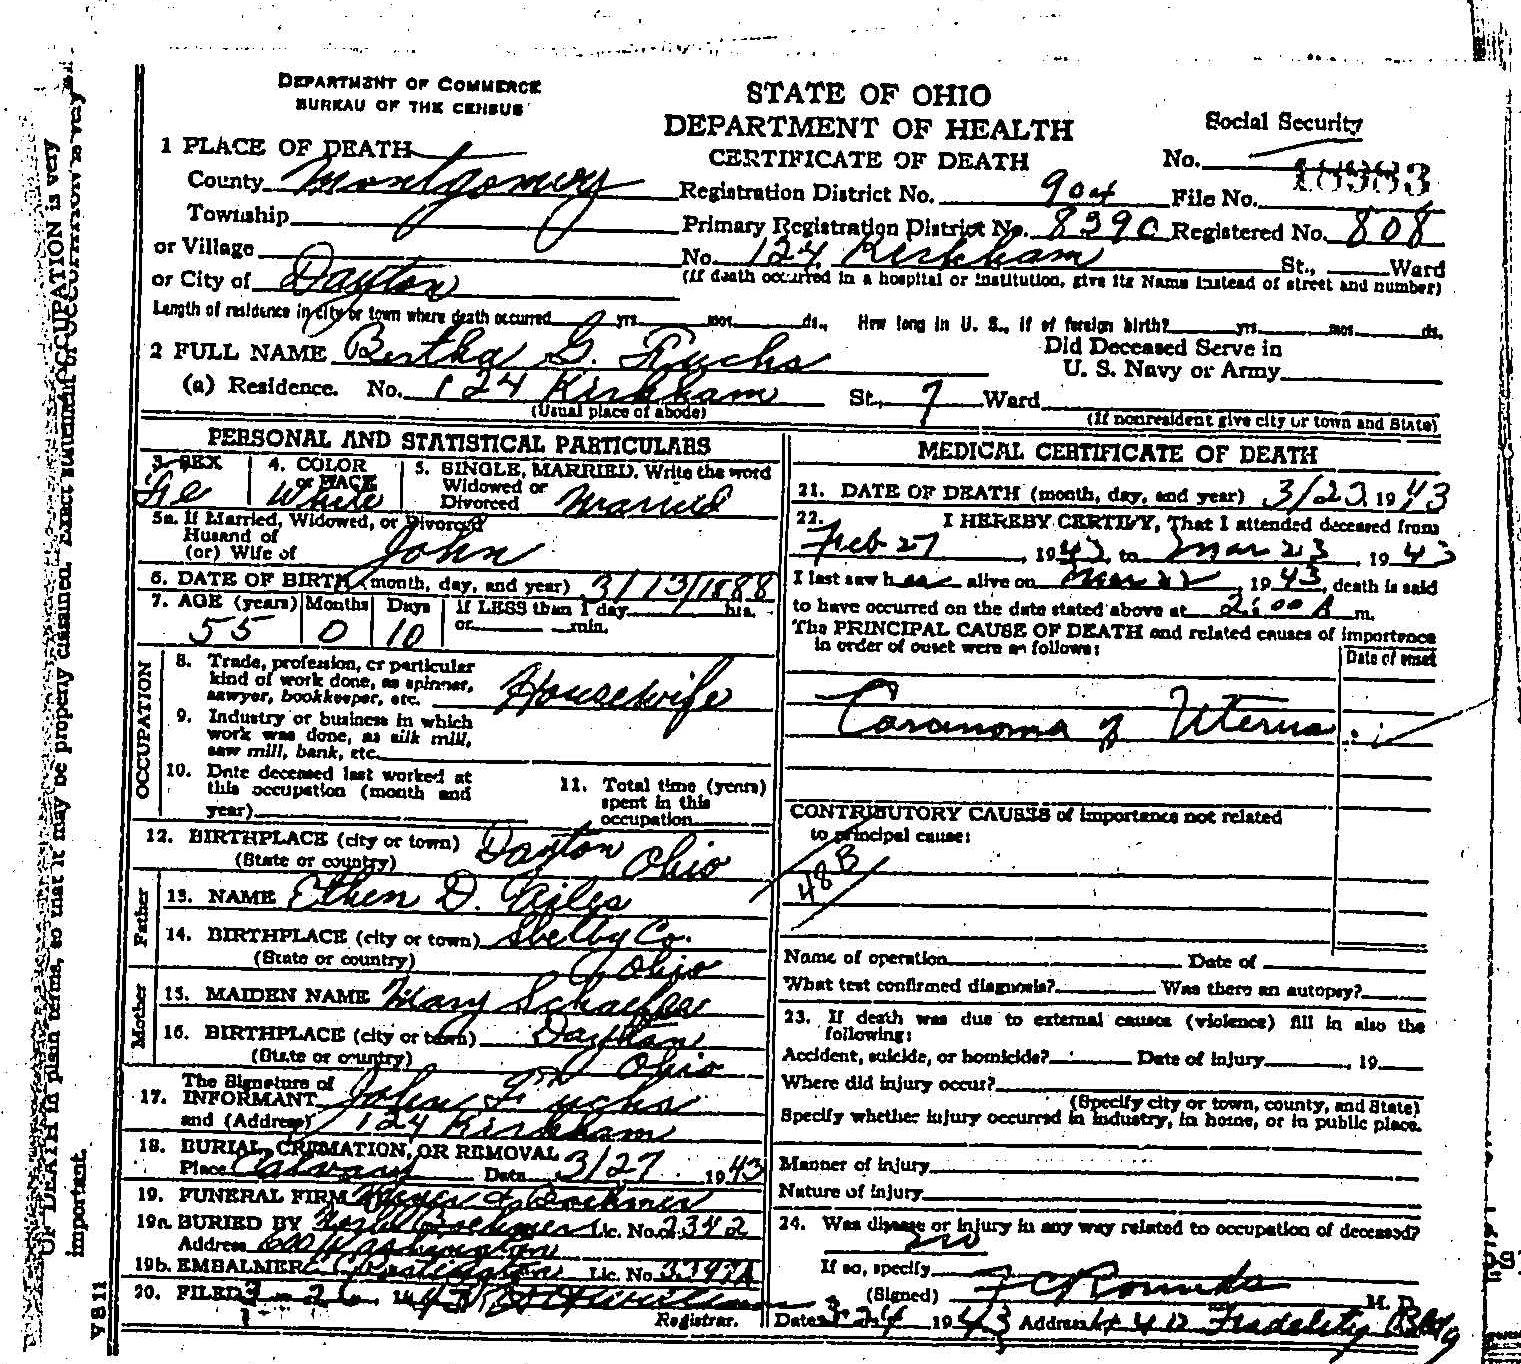 Death Record Bertha G Fuchs 1943 Montgomery County Ohio Tjl